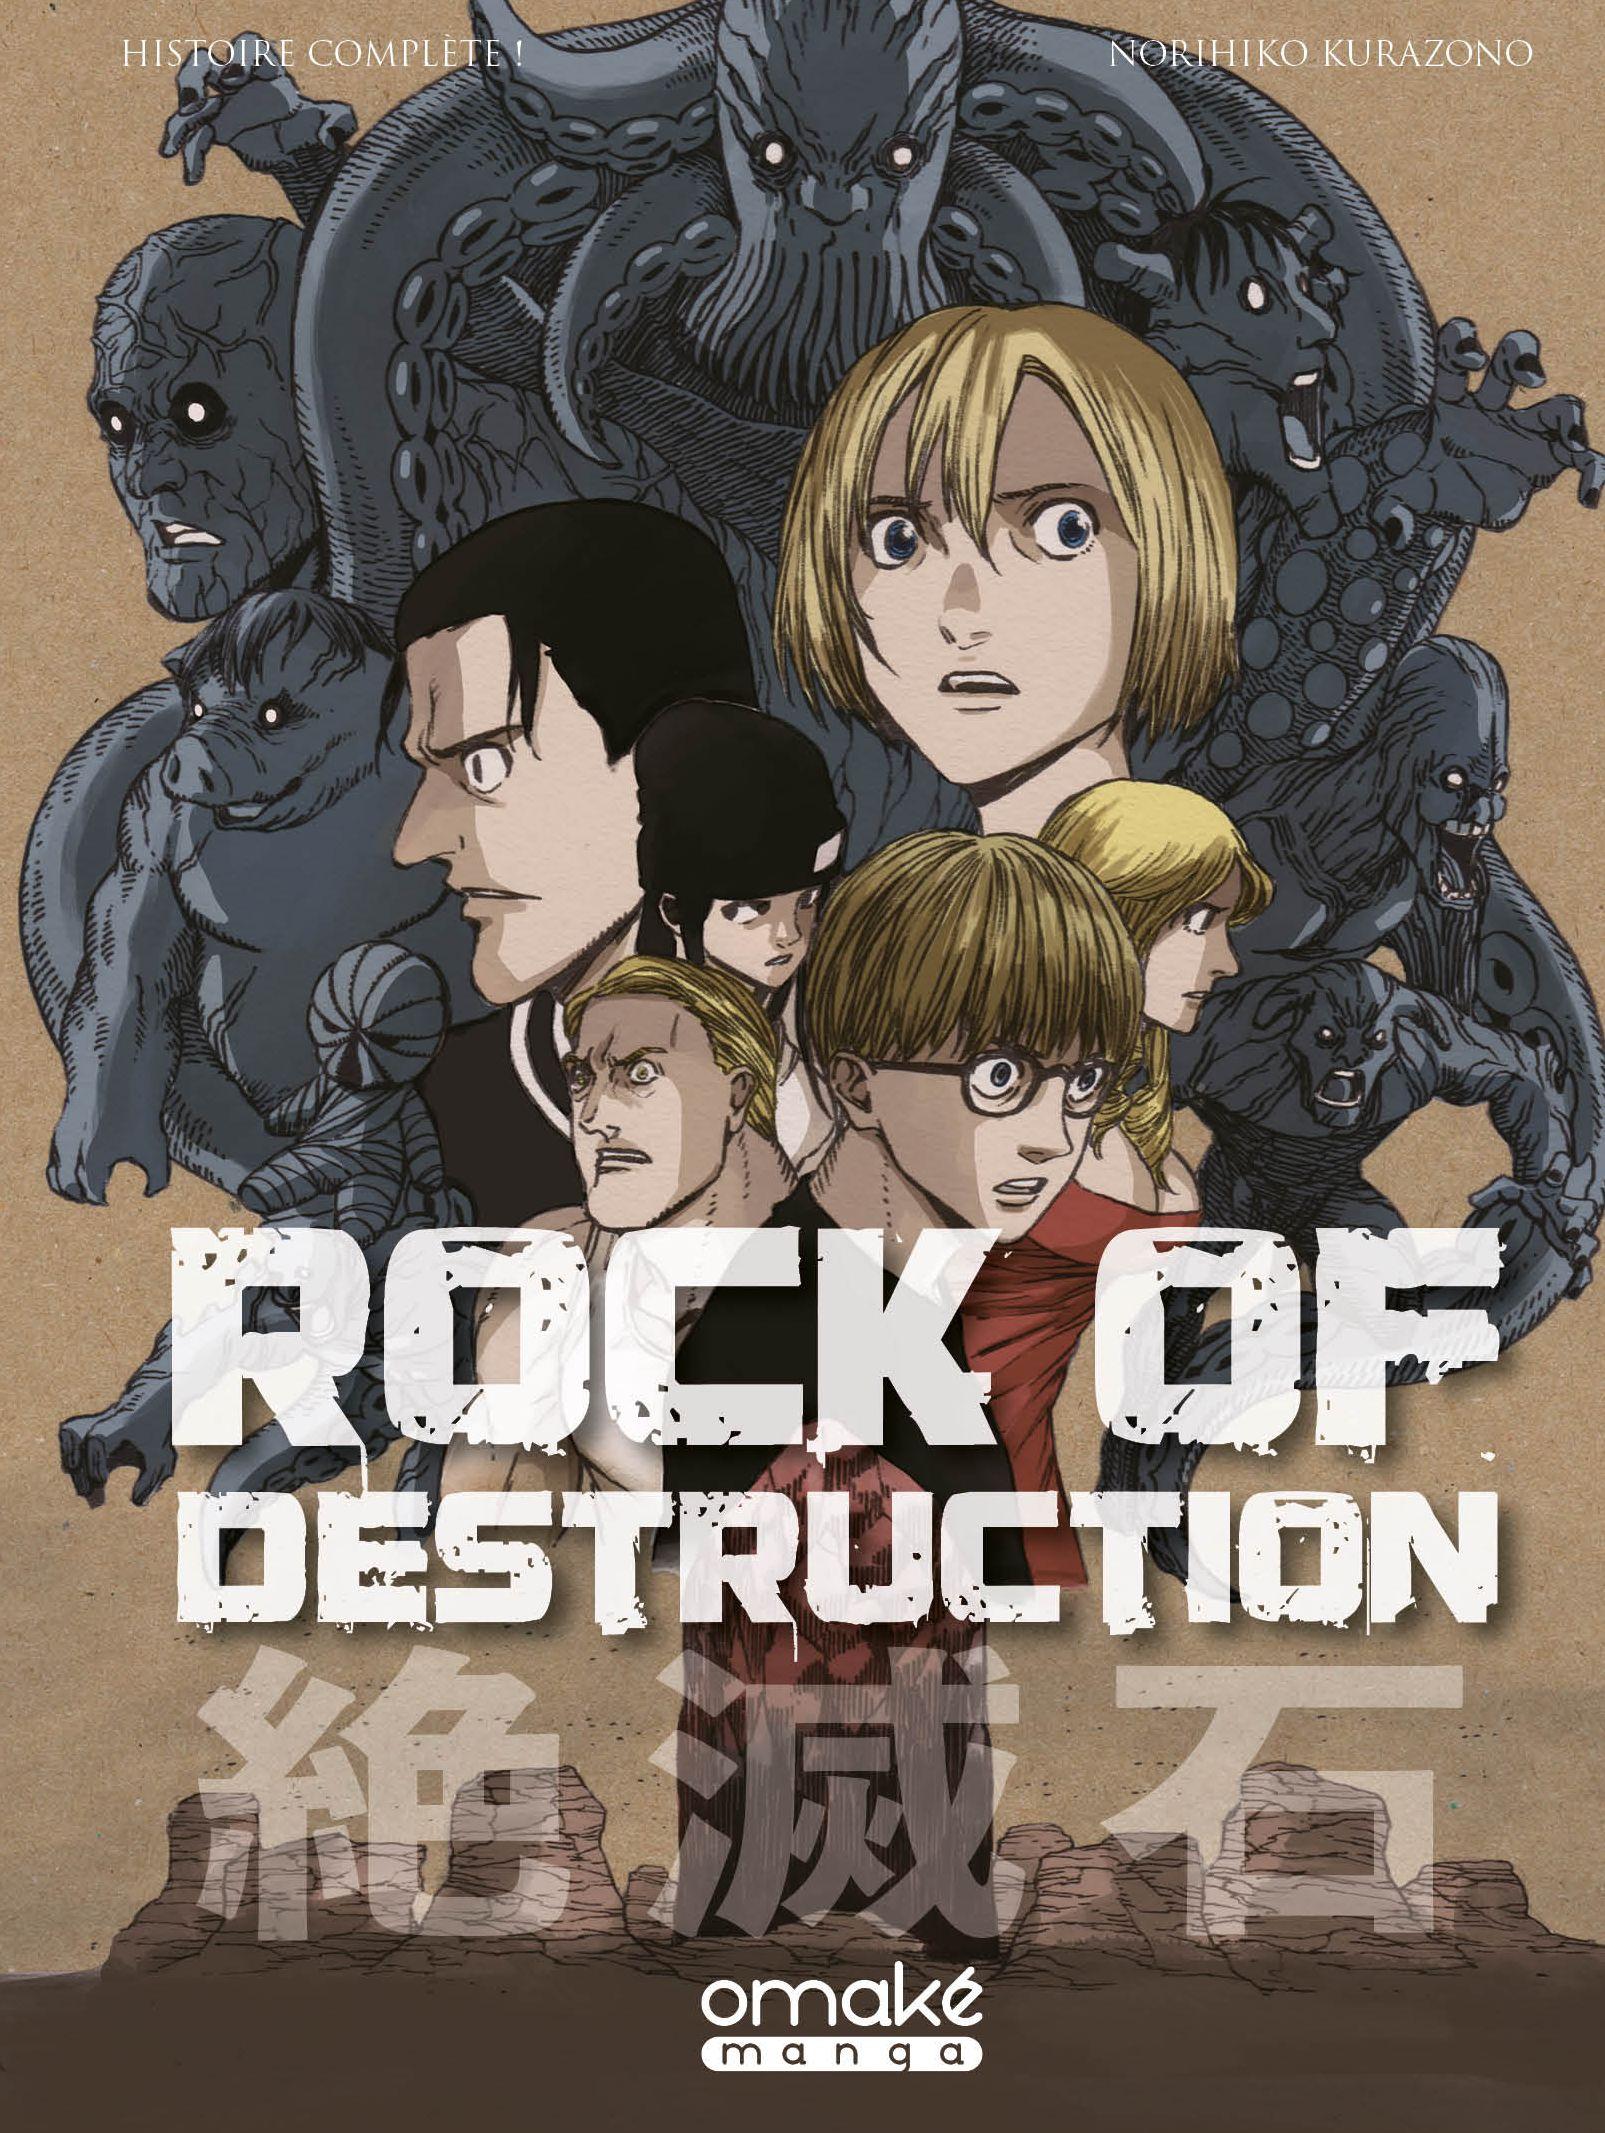 Rock of destruction Manga